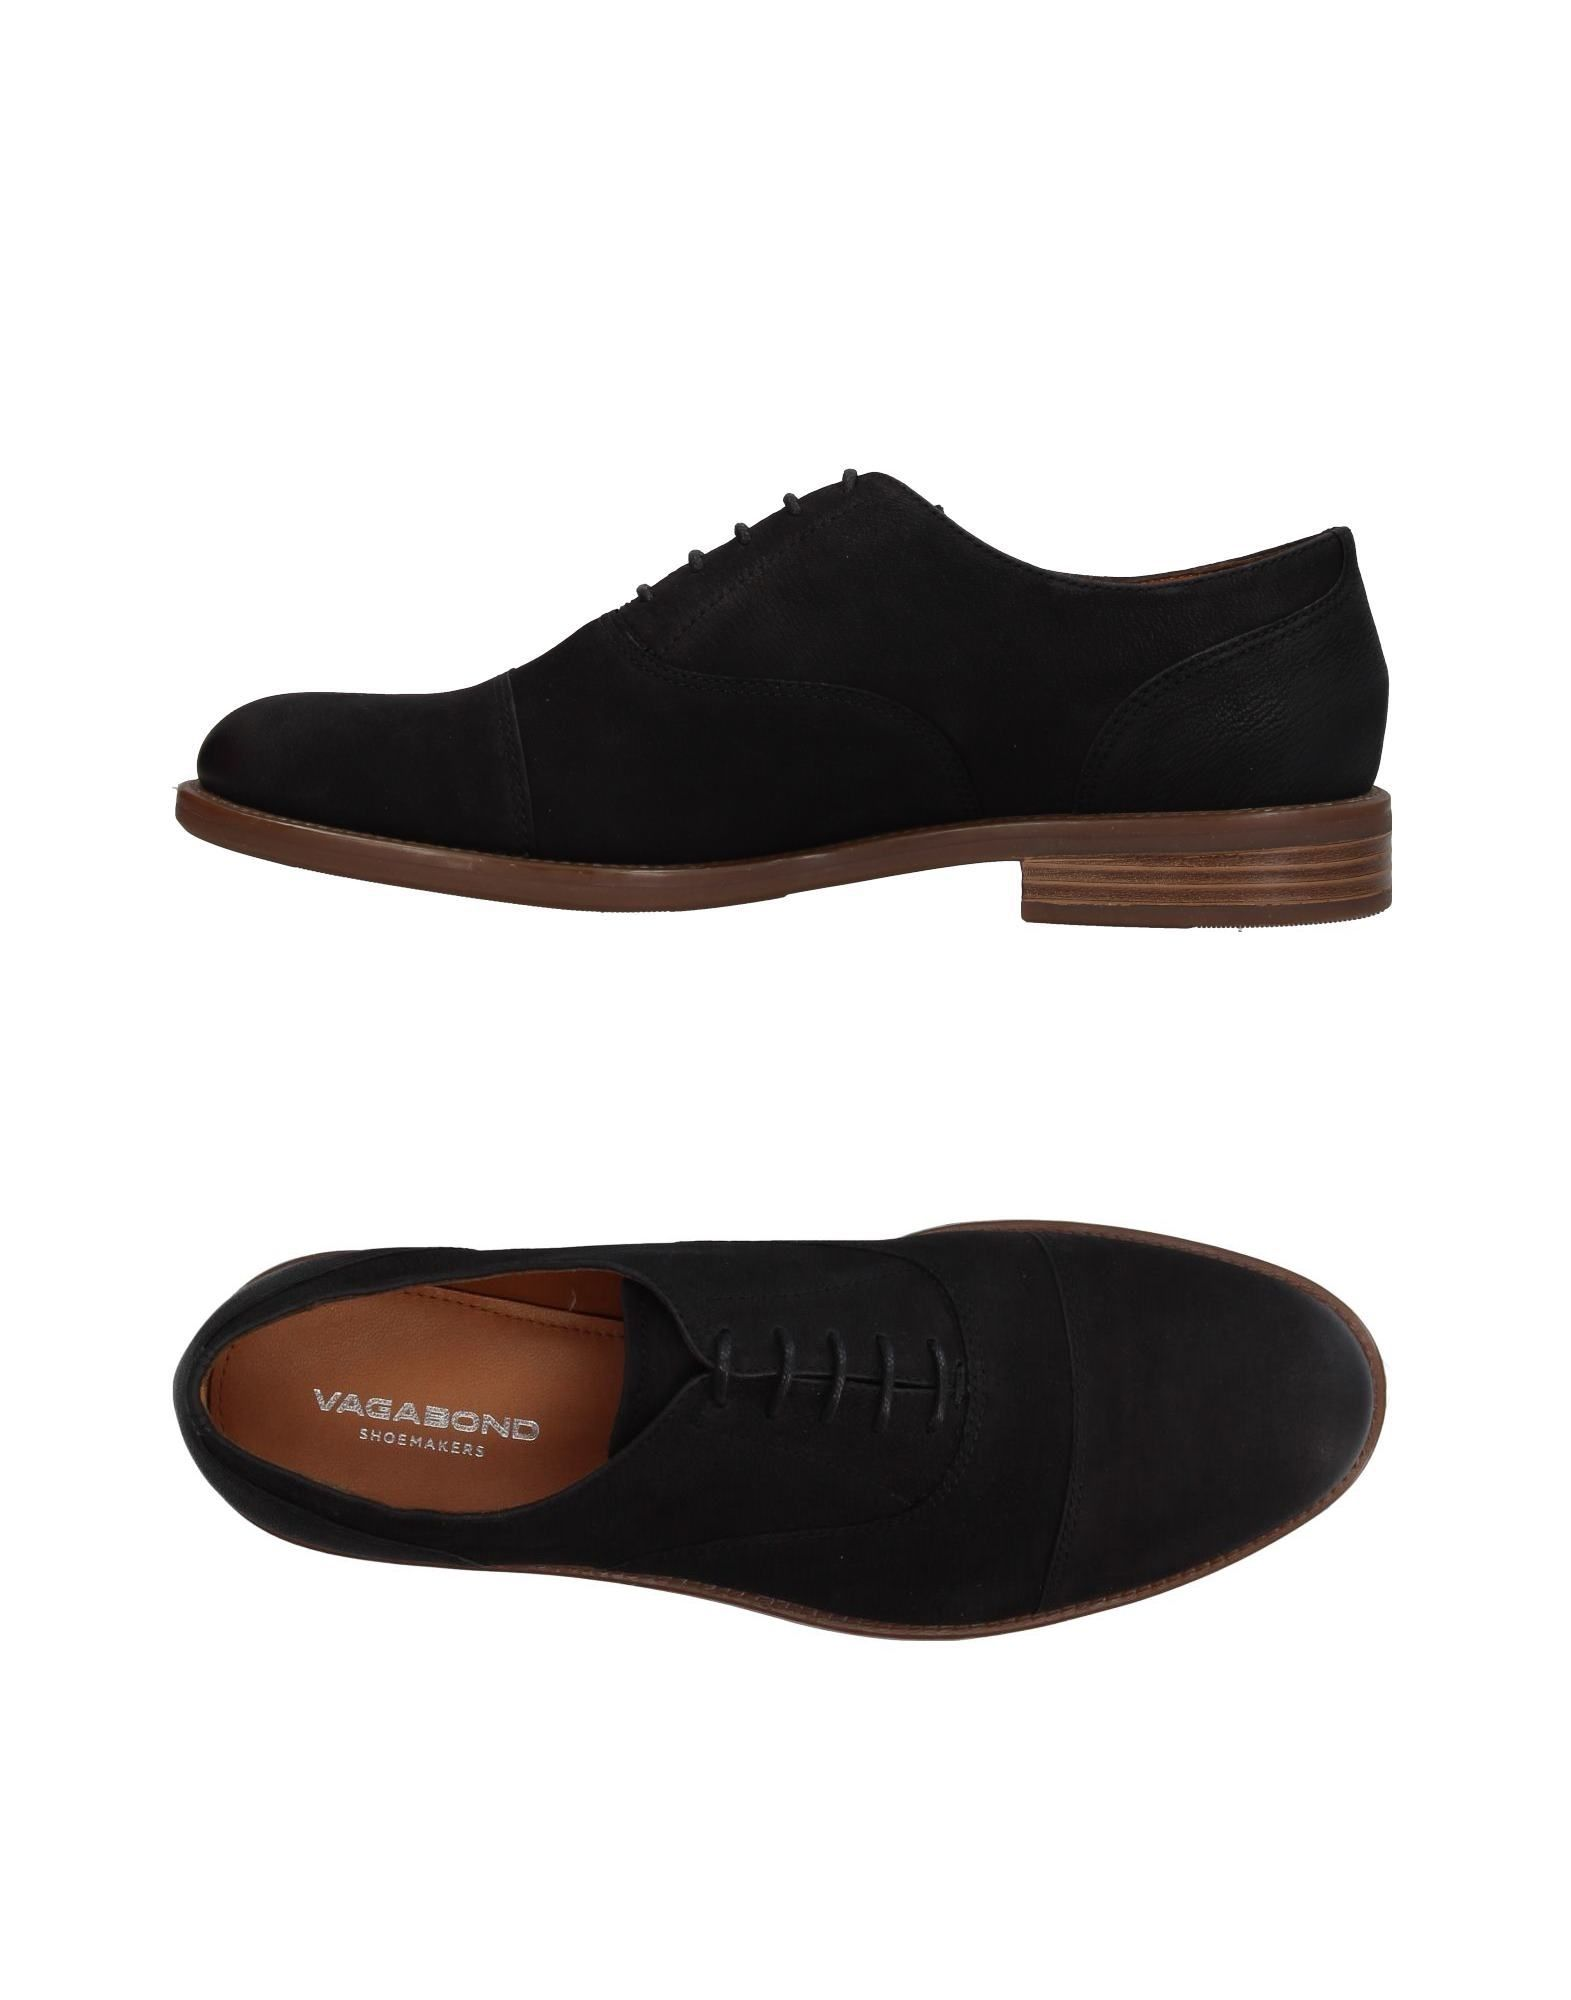 Stringate Vagabond Shoemakers Uomo - 11387795QU 11387795QU - f54bb7